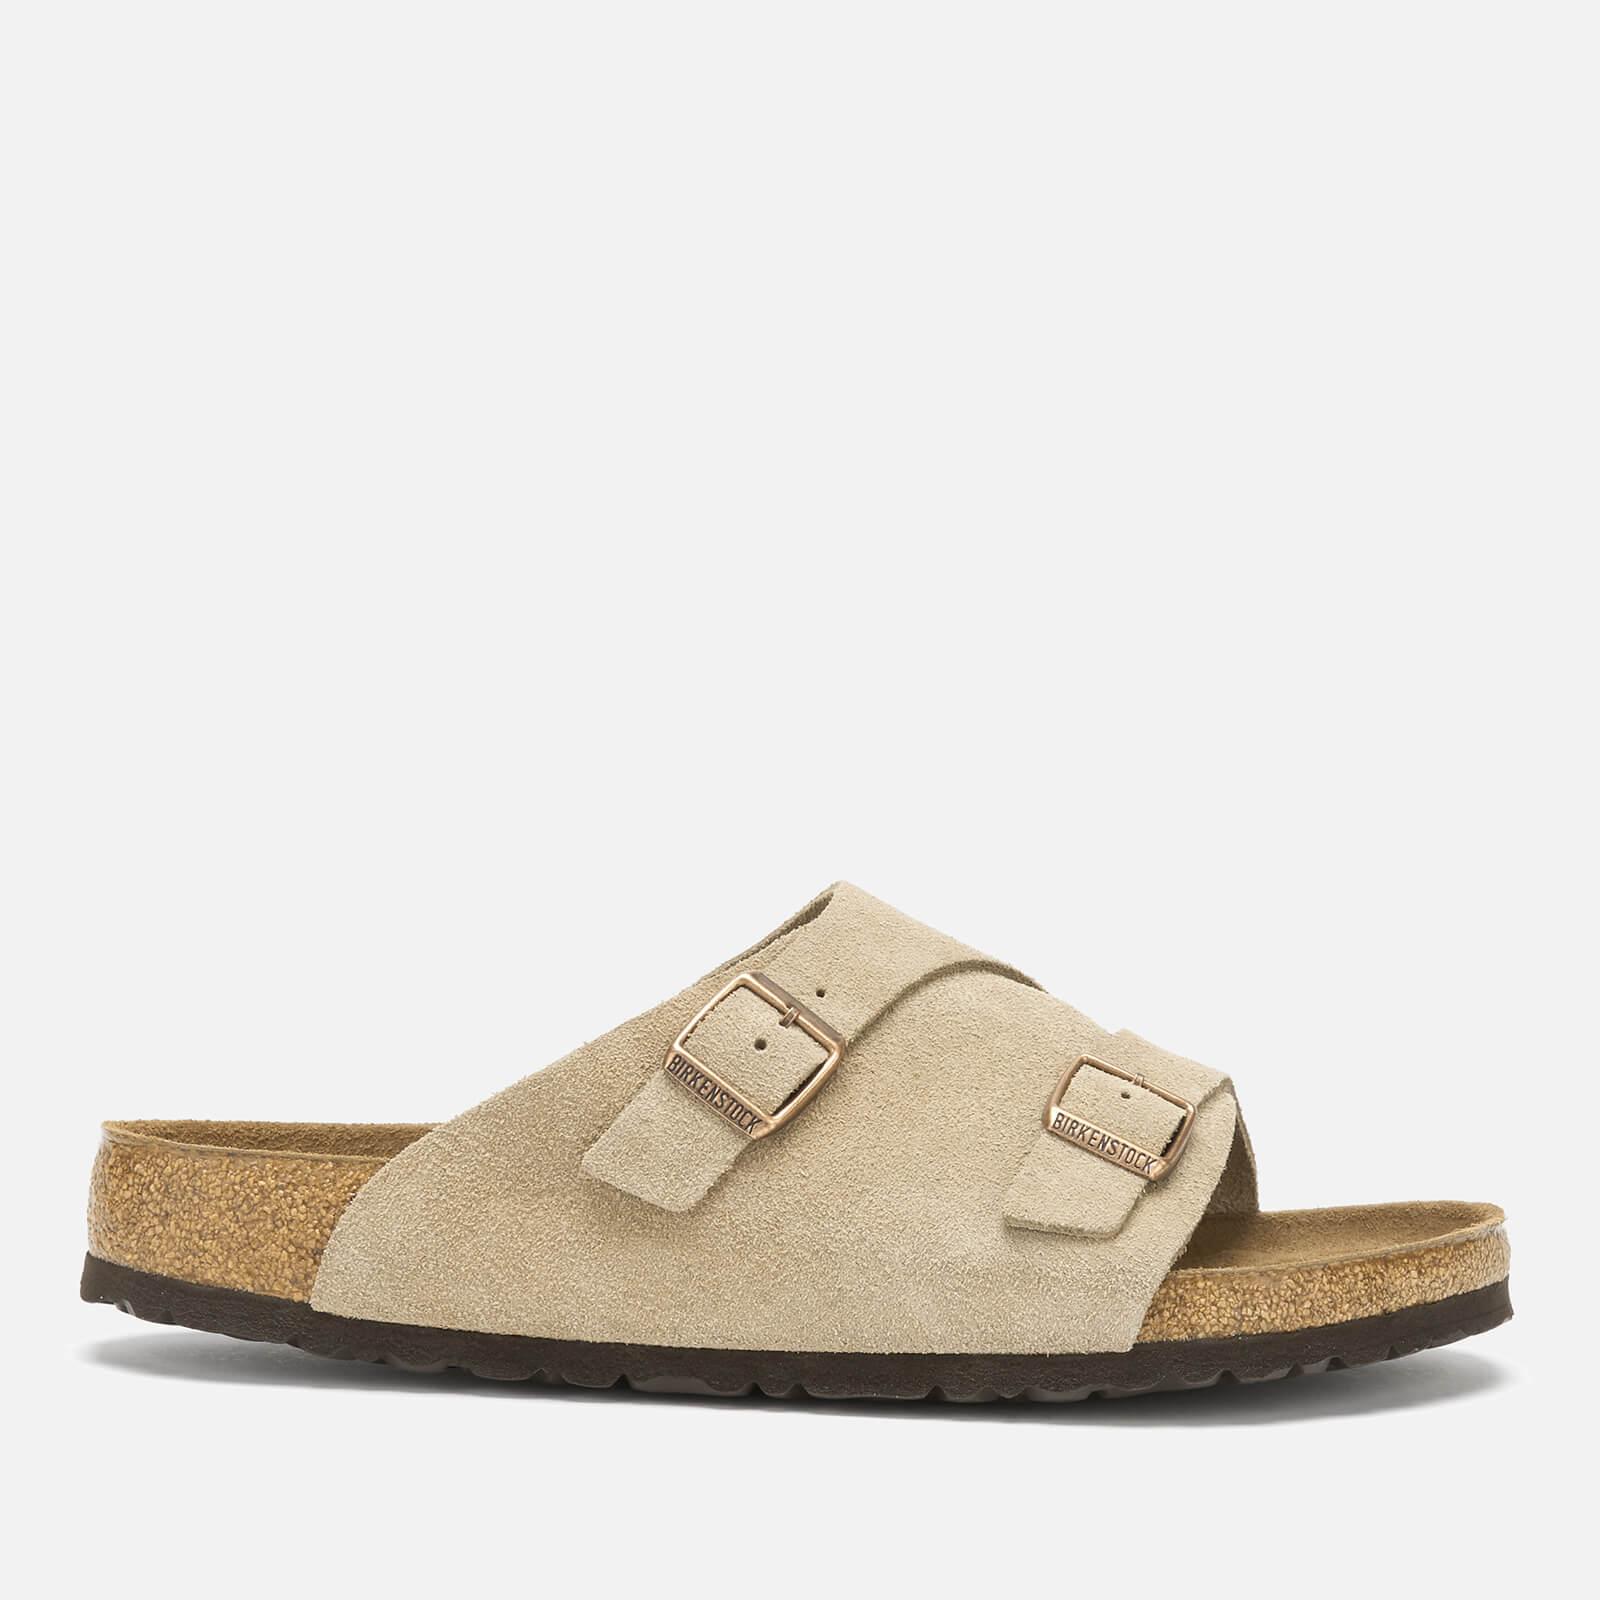 Birkenstock Men's Zurich Sfb Suede Slide Sandals - Taupe - EU 43/UK 9